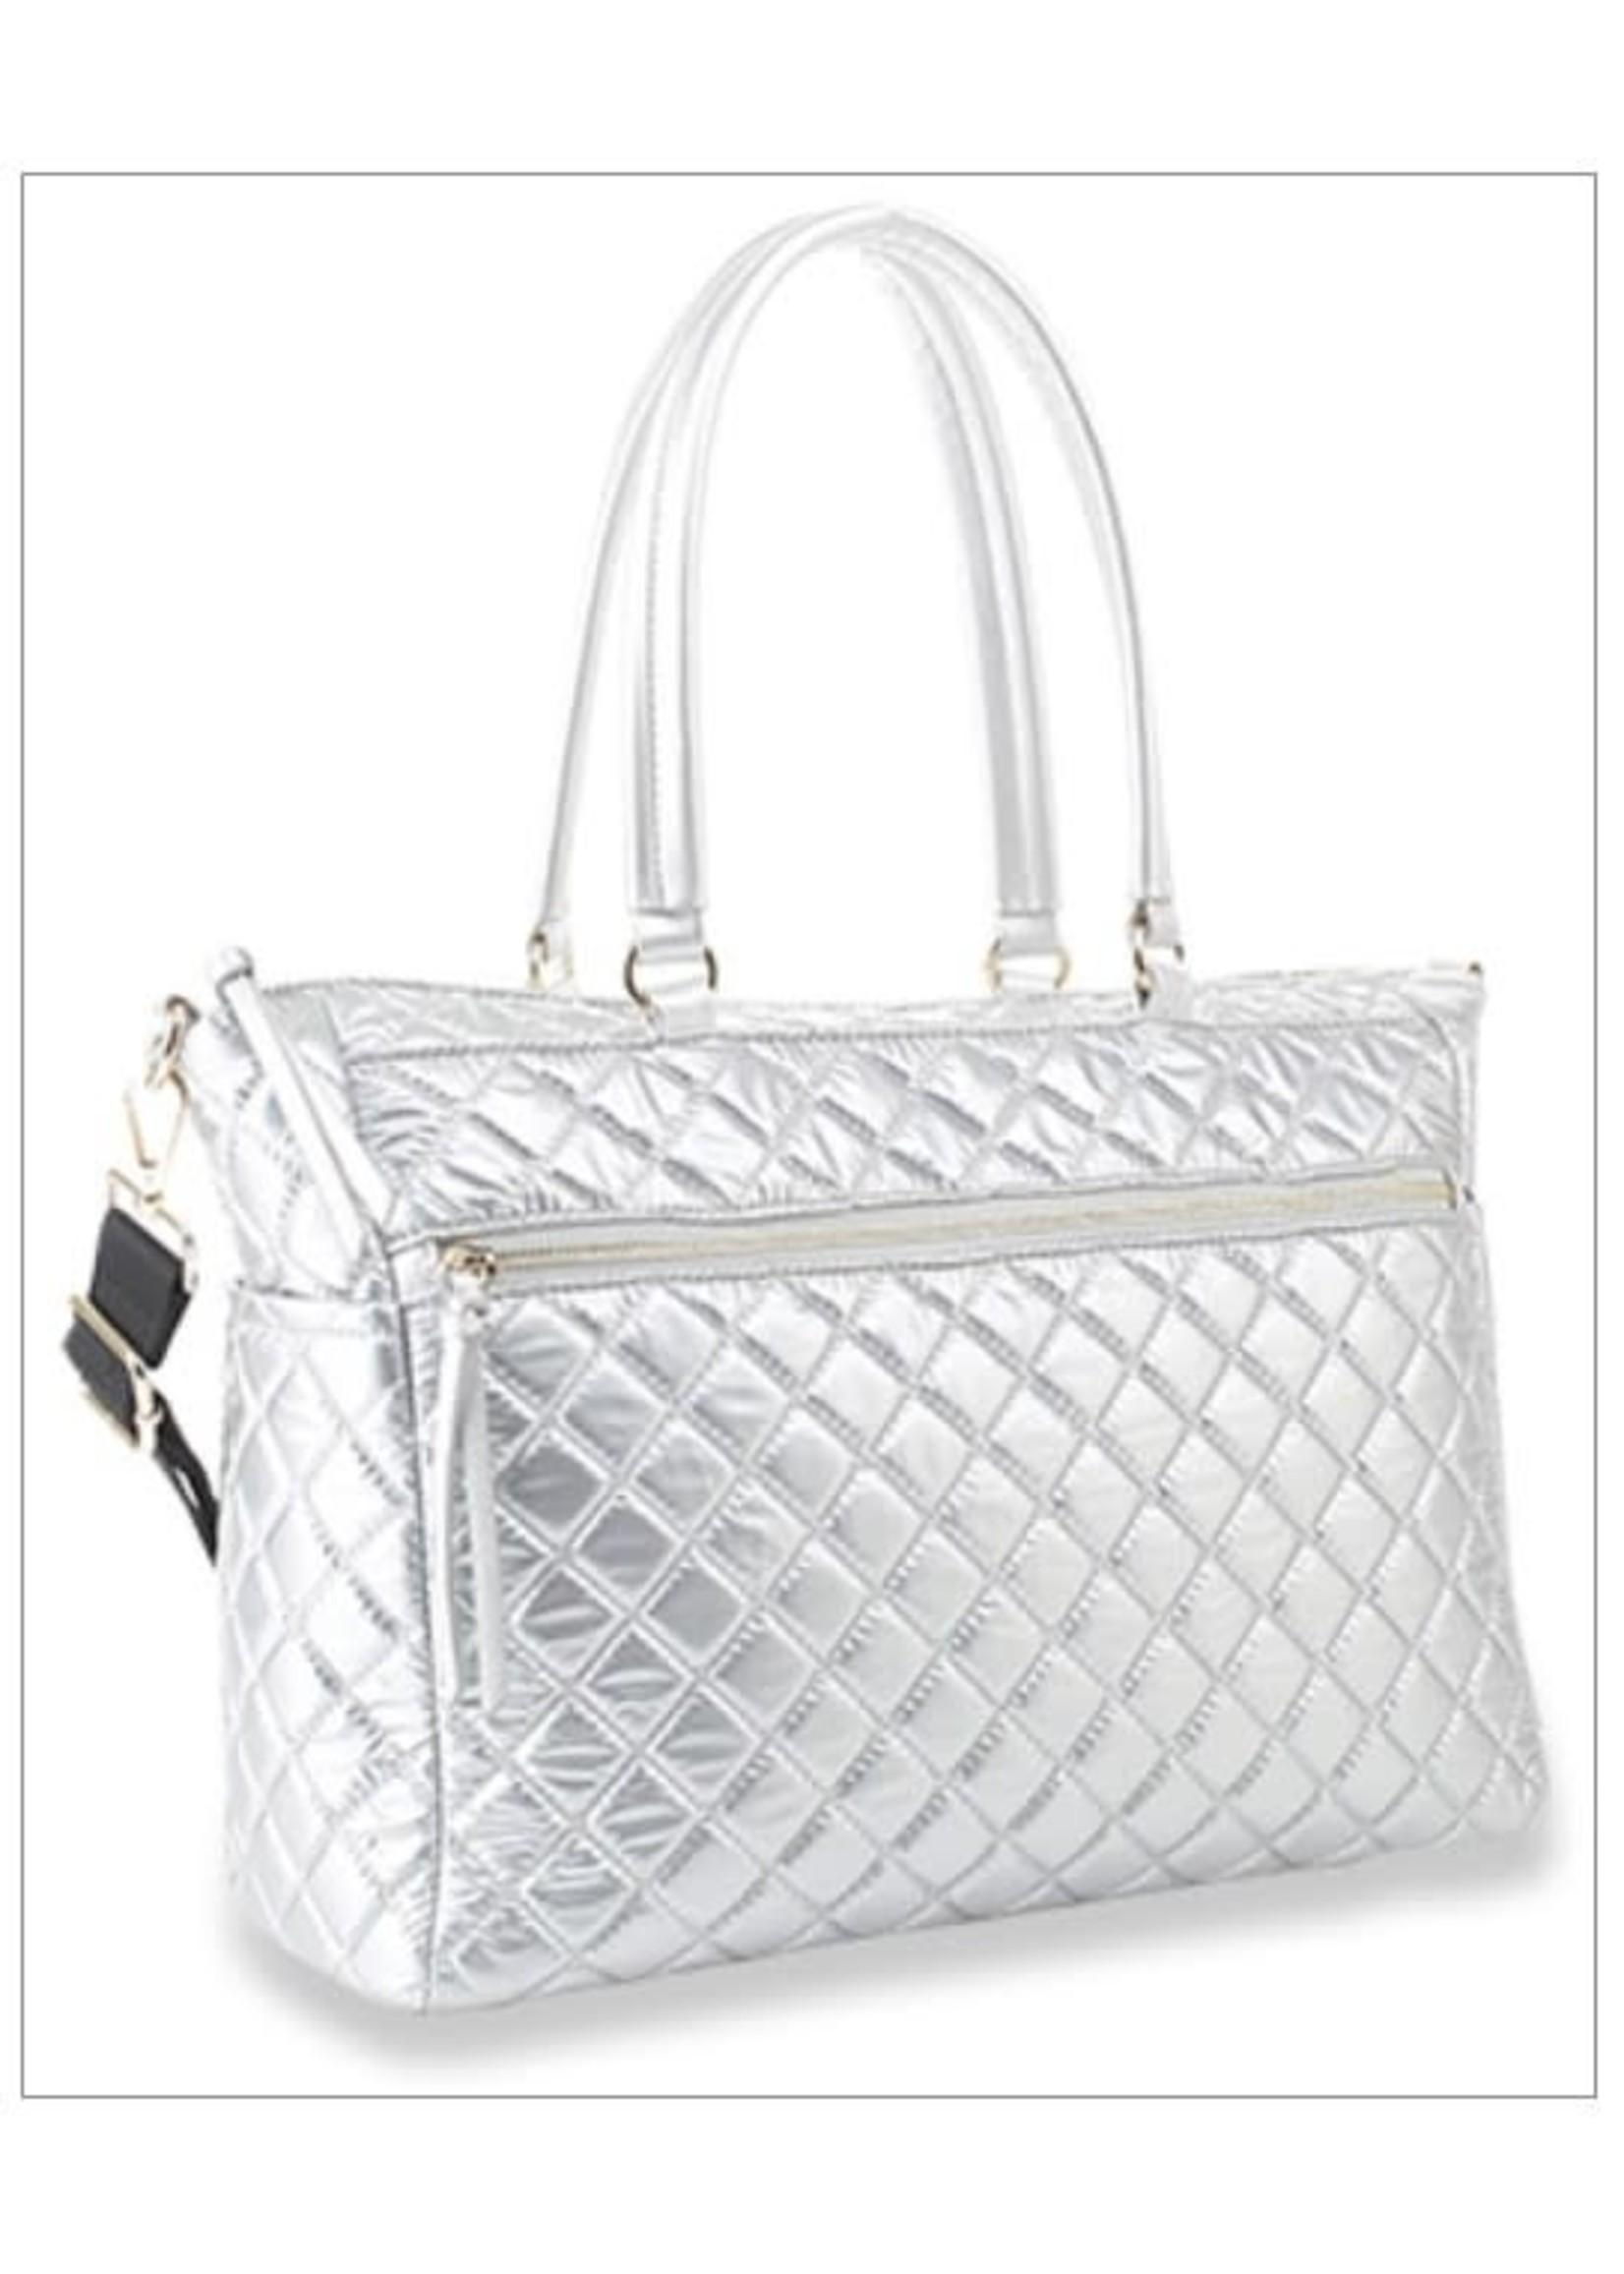 Shimmer Quilted Tote Handbag